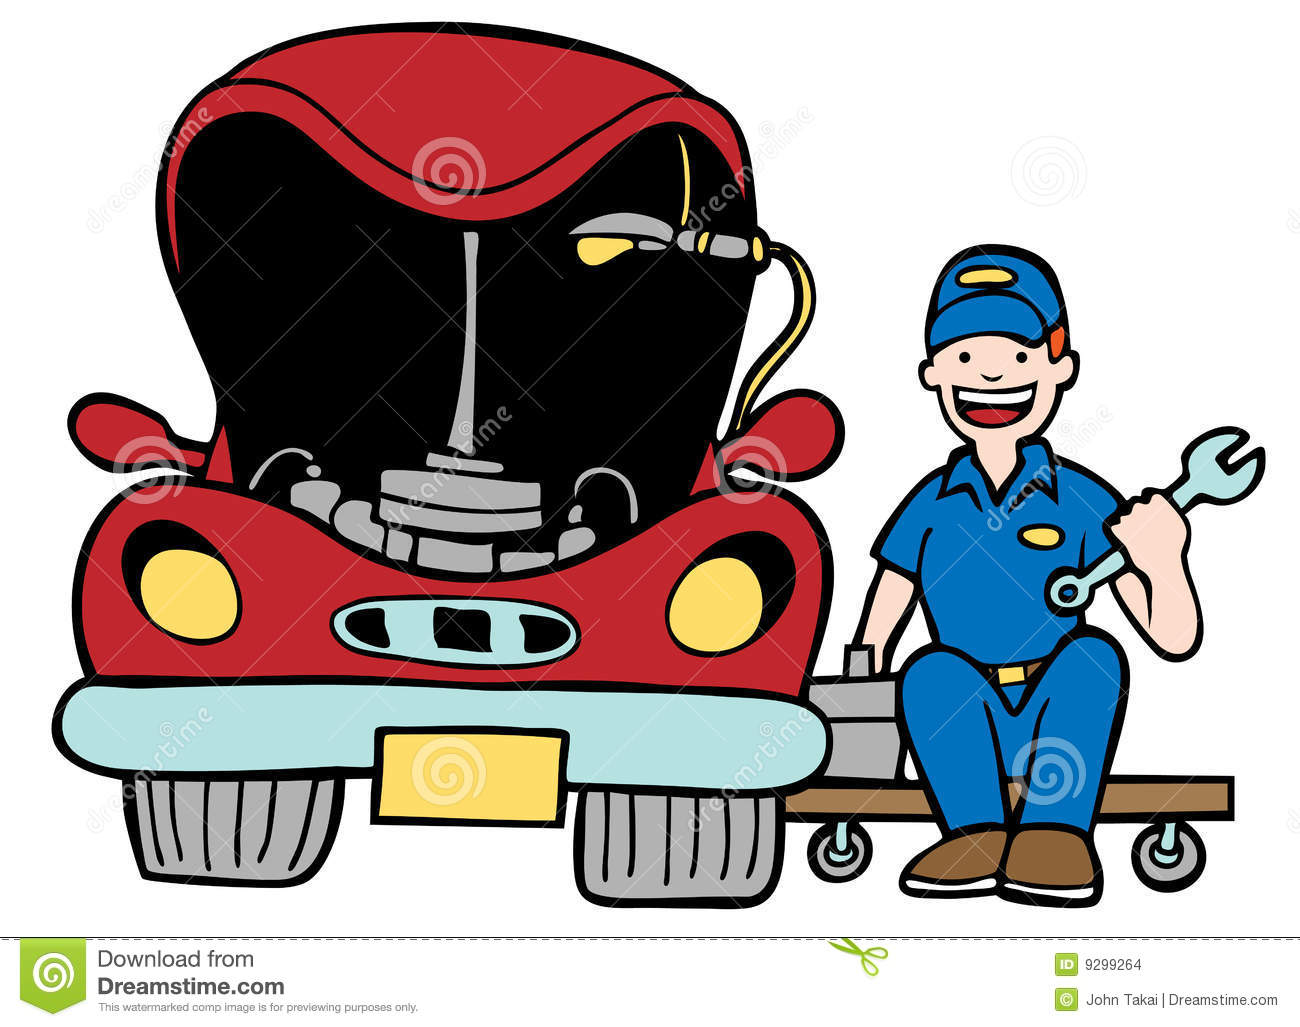 Maintenance vehicle clipart #2